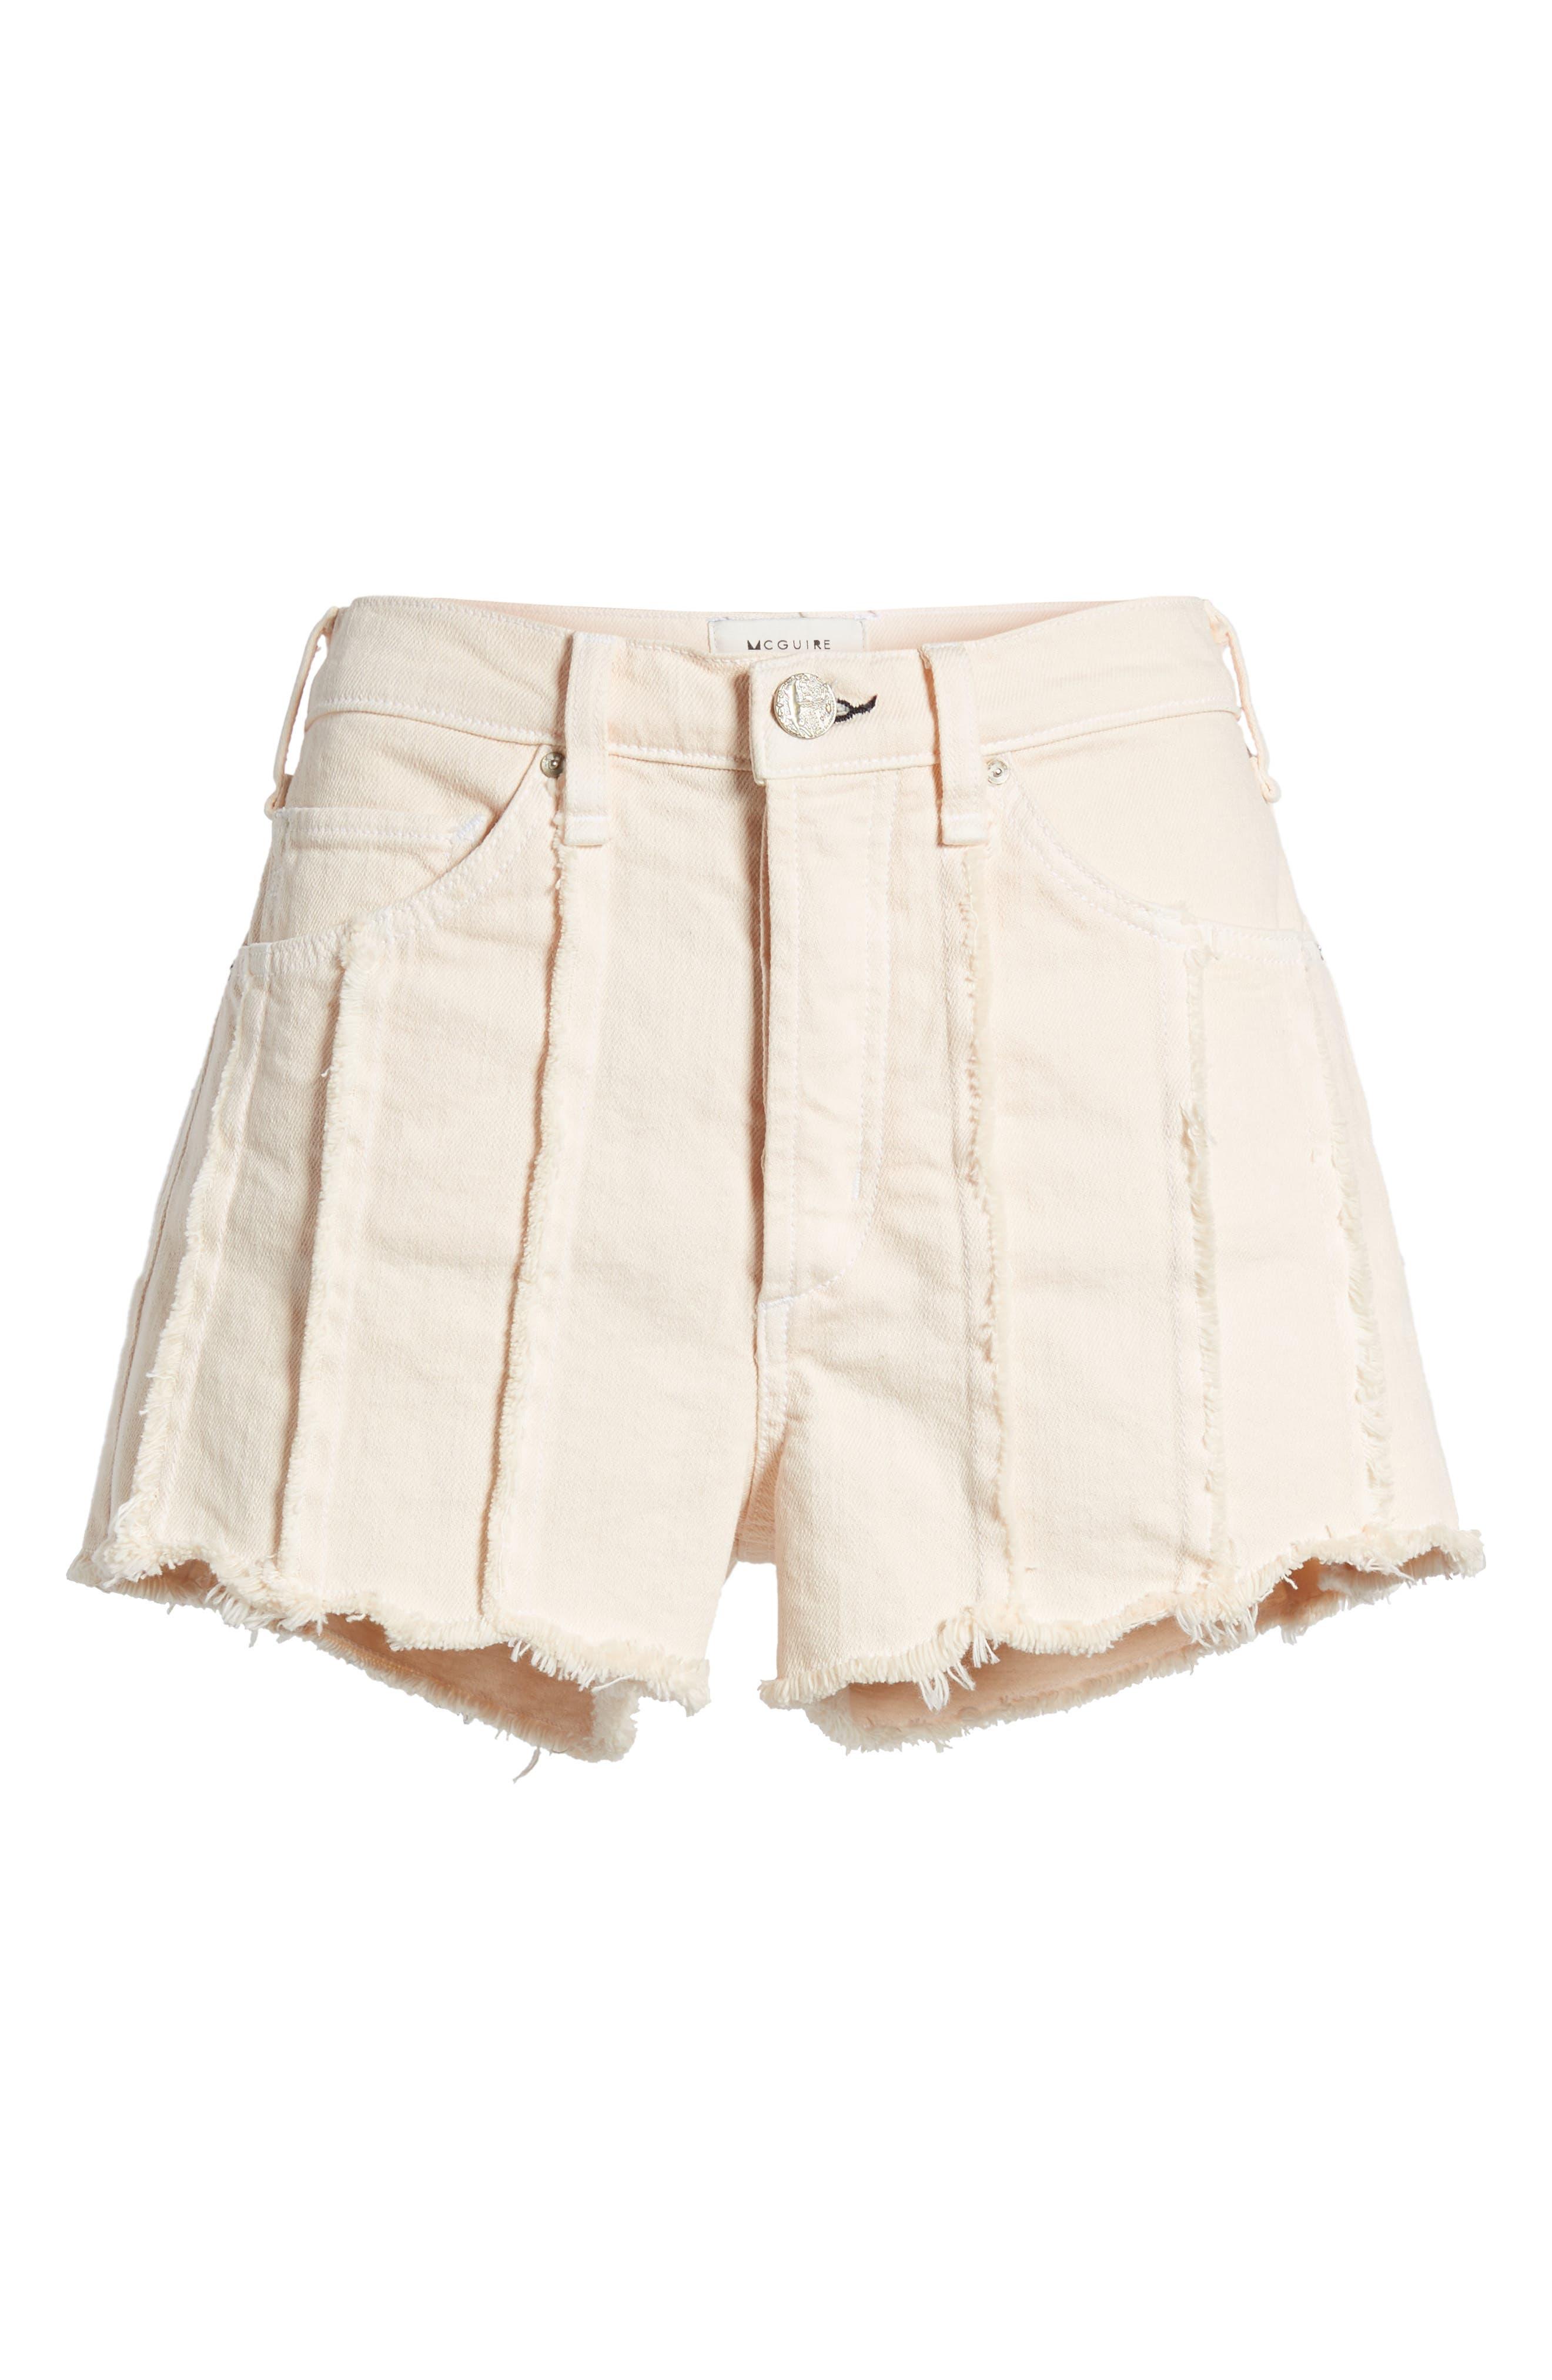 Georgia May High Waist Shorts,                             Alternate thumbnail 7, color,                             Baby Flamingo